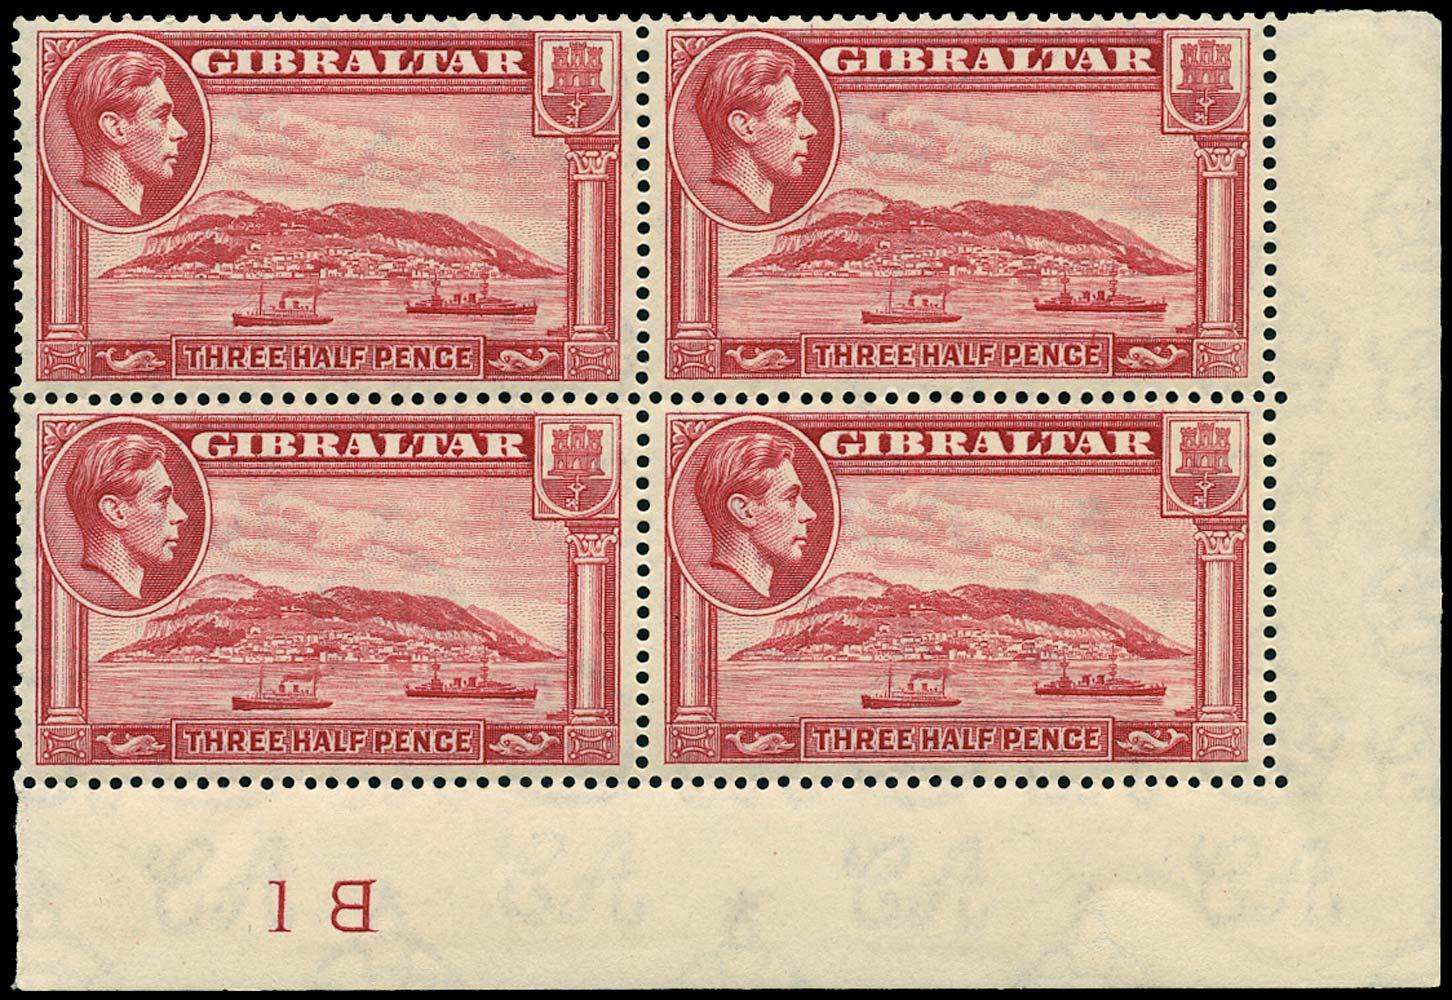 GIBRALTAR 1938  SG123 Mint 1½d carmine perf 14 unmounted